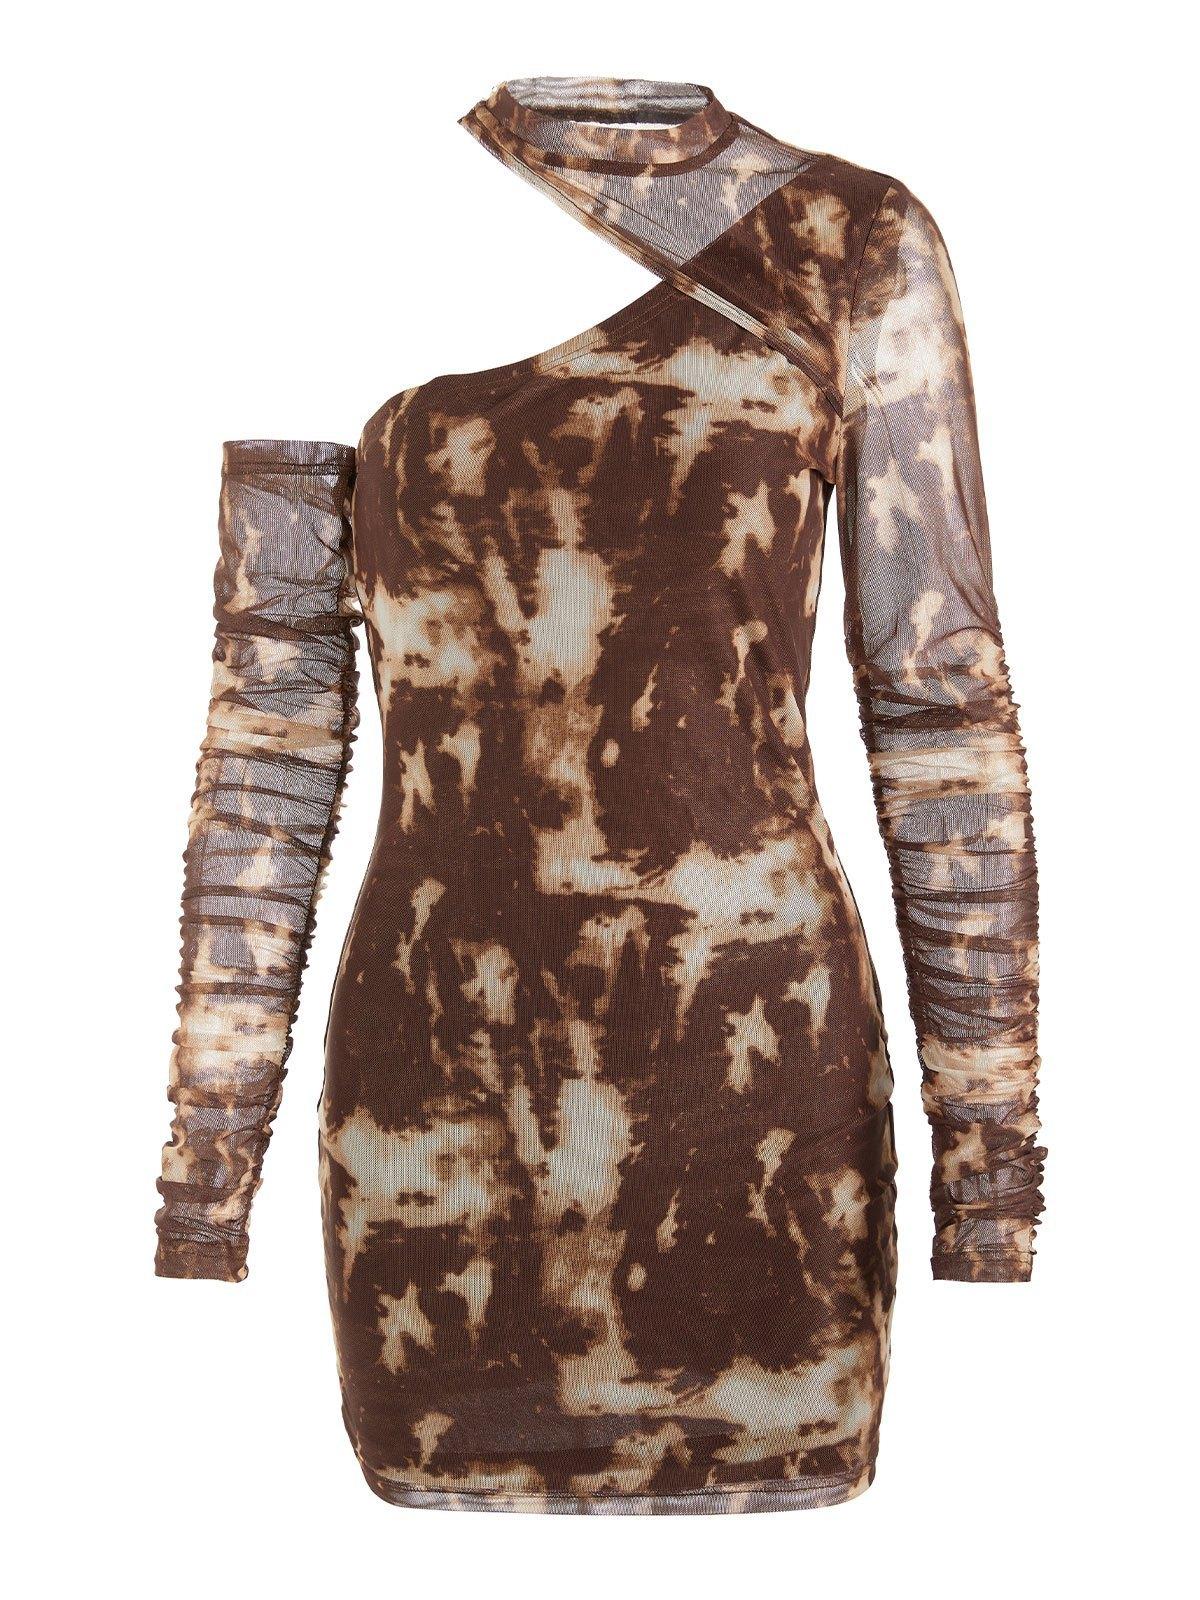 EMMIOL Cutout Tie Dye Long Sleeve Midi Dress - Brown L